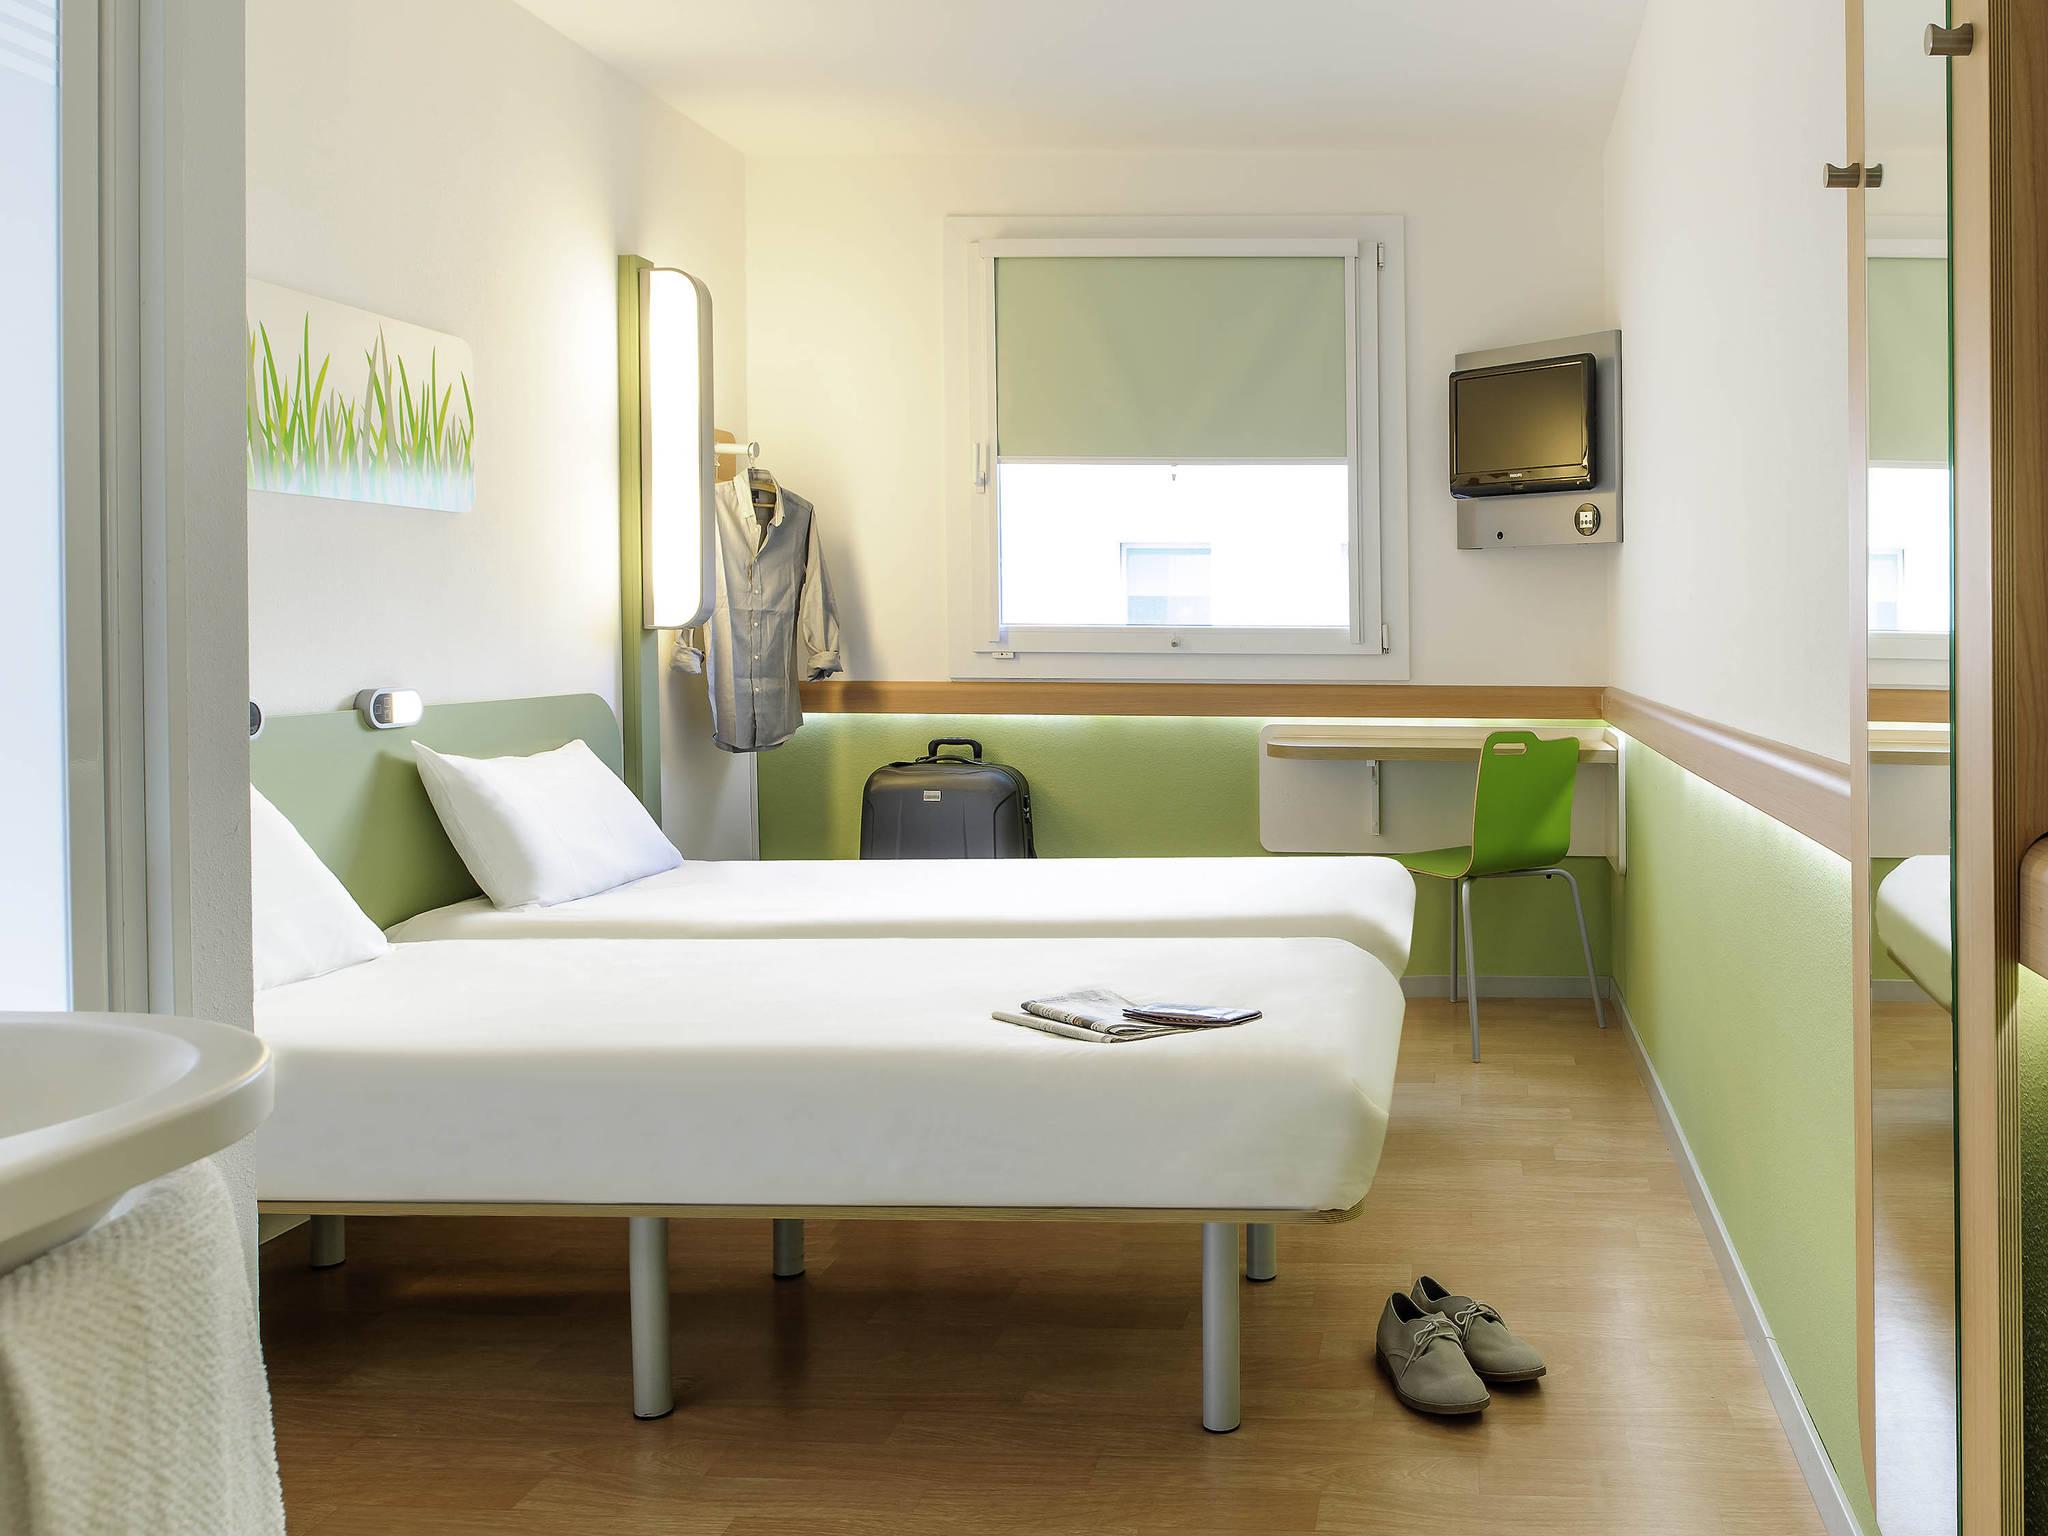 hotel ibis budget hamburg altona. book now! free wifi!, Hause deko